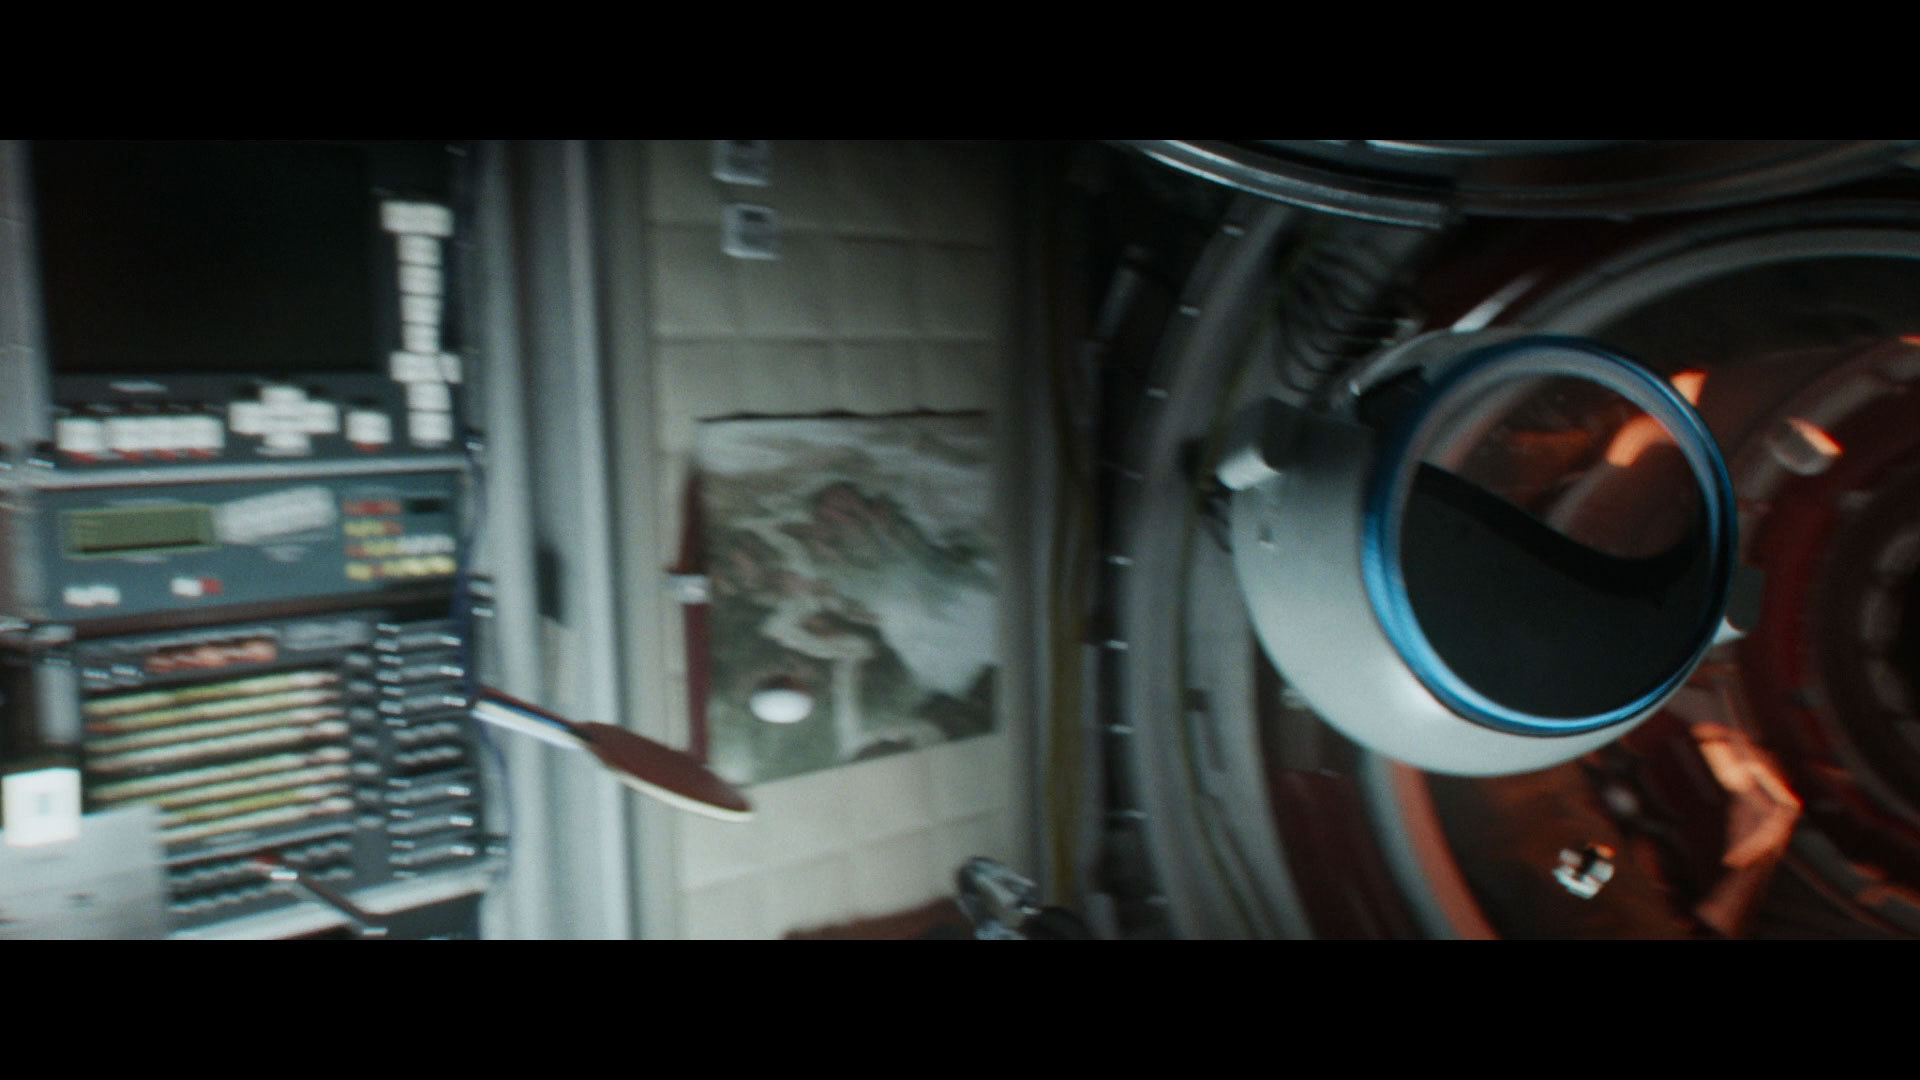 trah-na-korable-film-odna-baba-na-dvoih-muzhikov